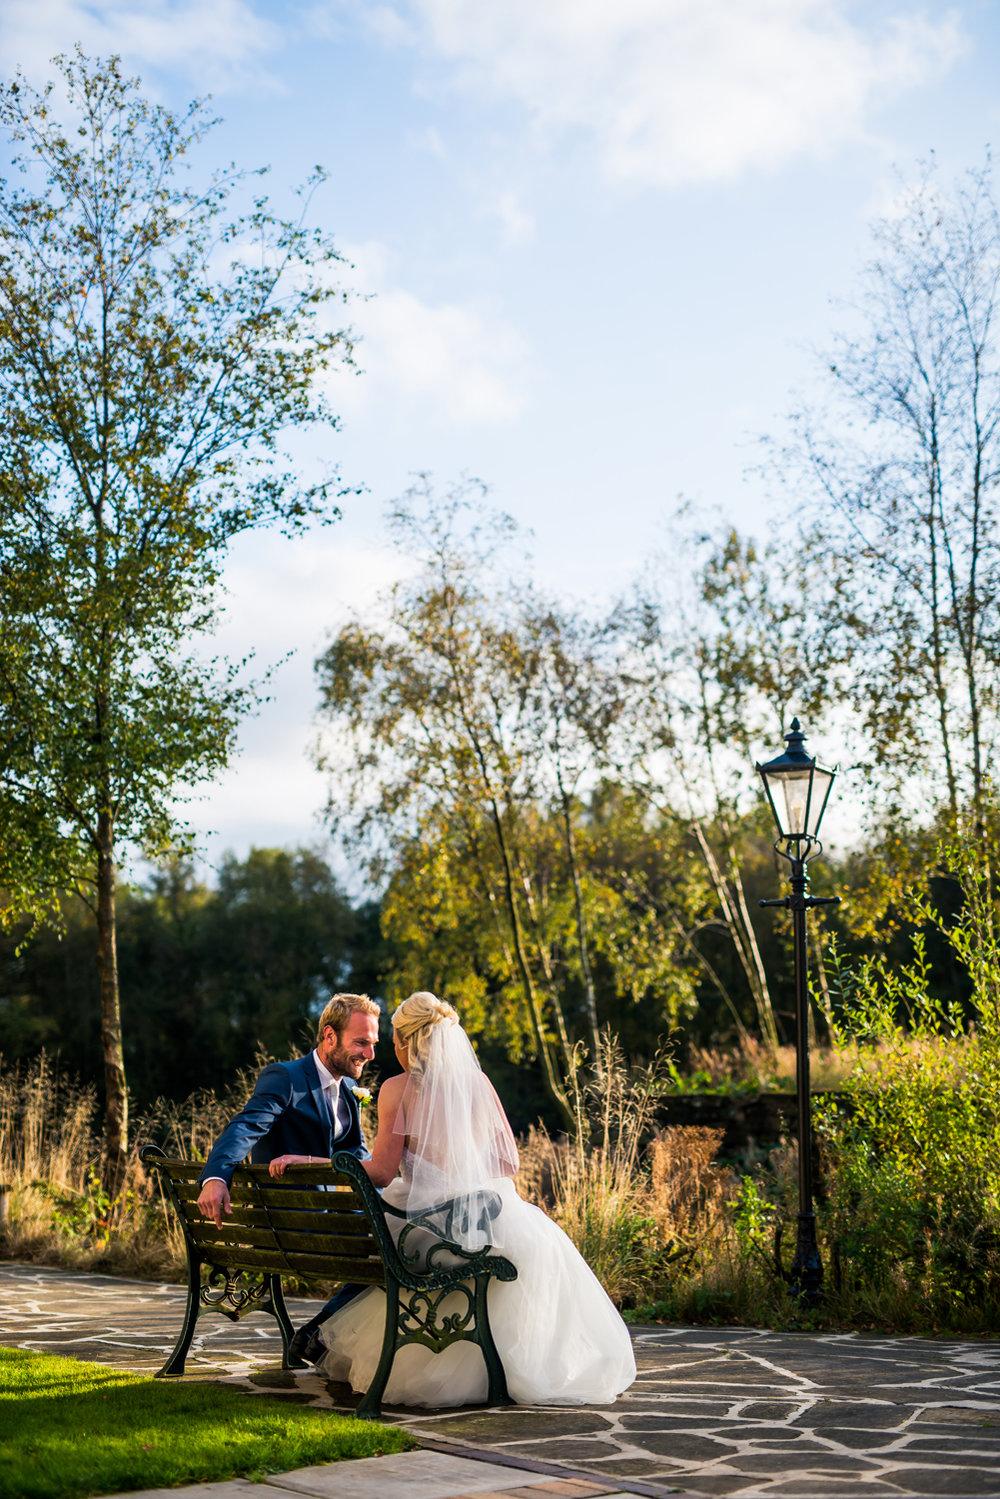 Emma and Martin wedding photos  (246 of 299).jpg